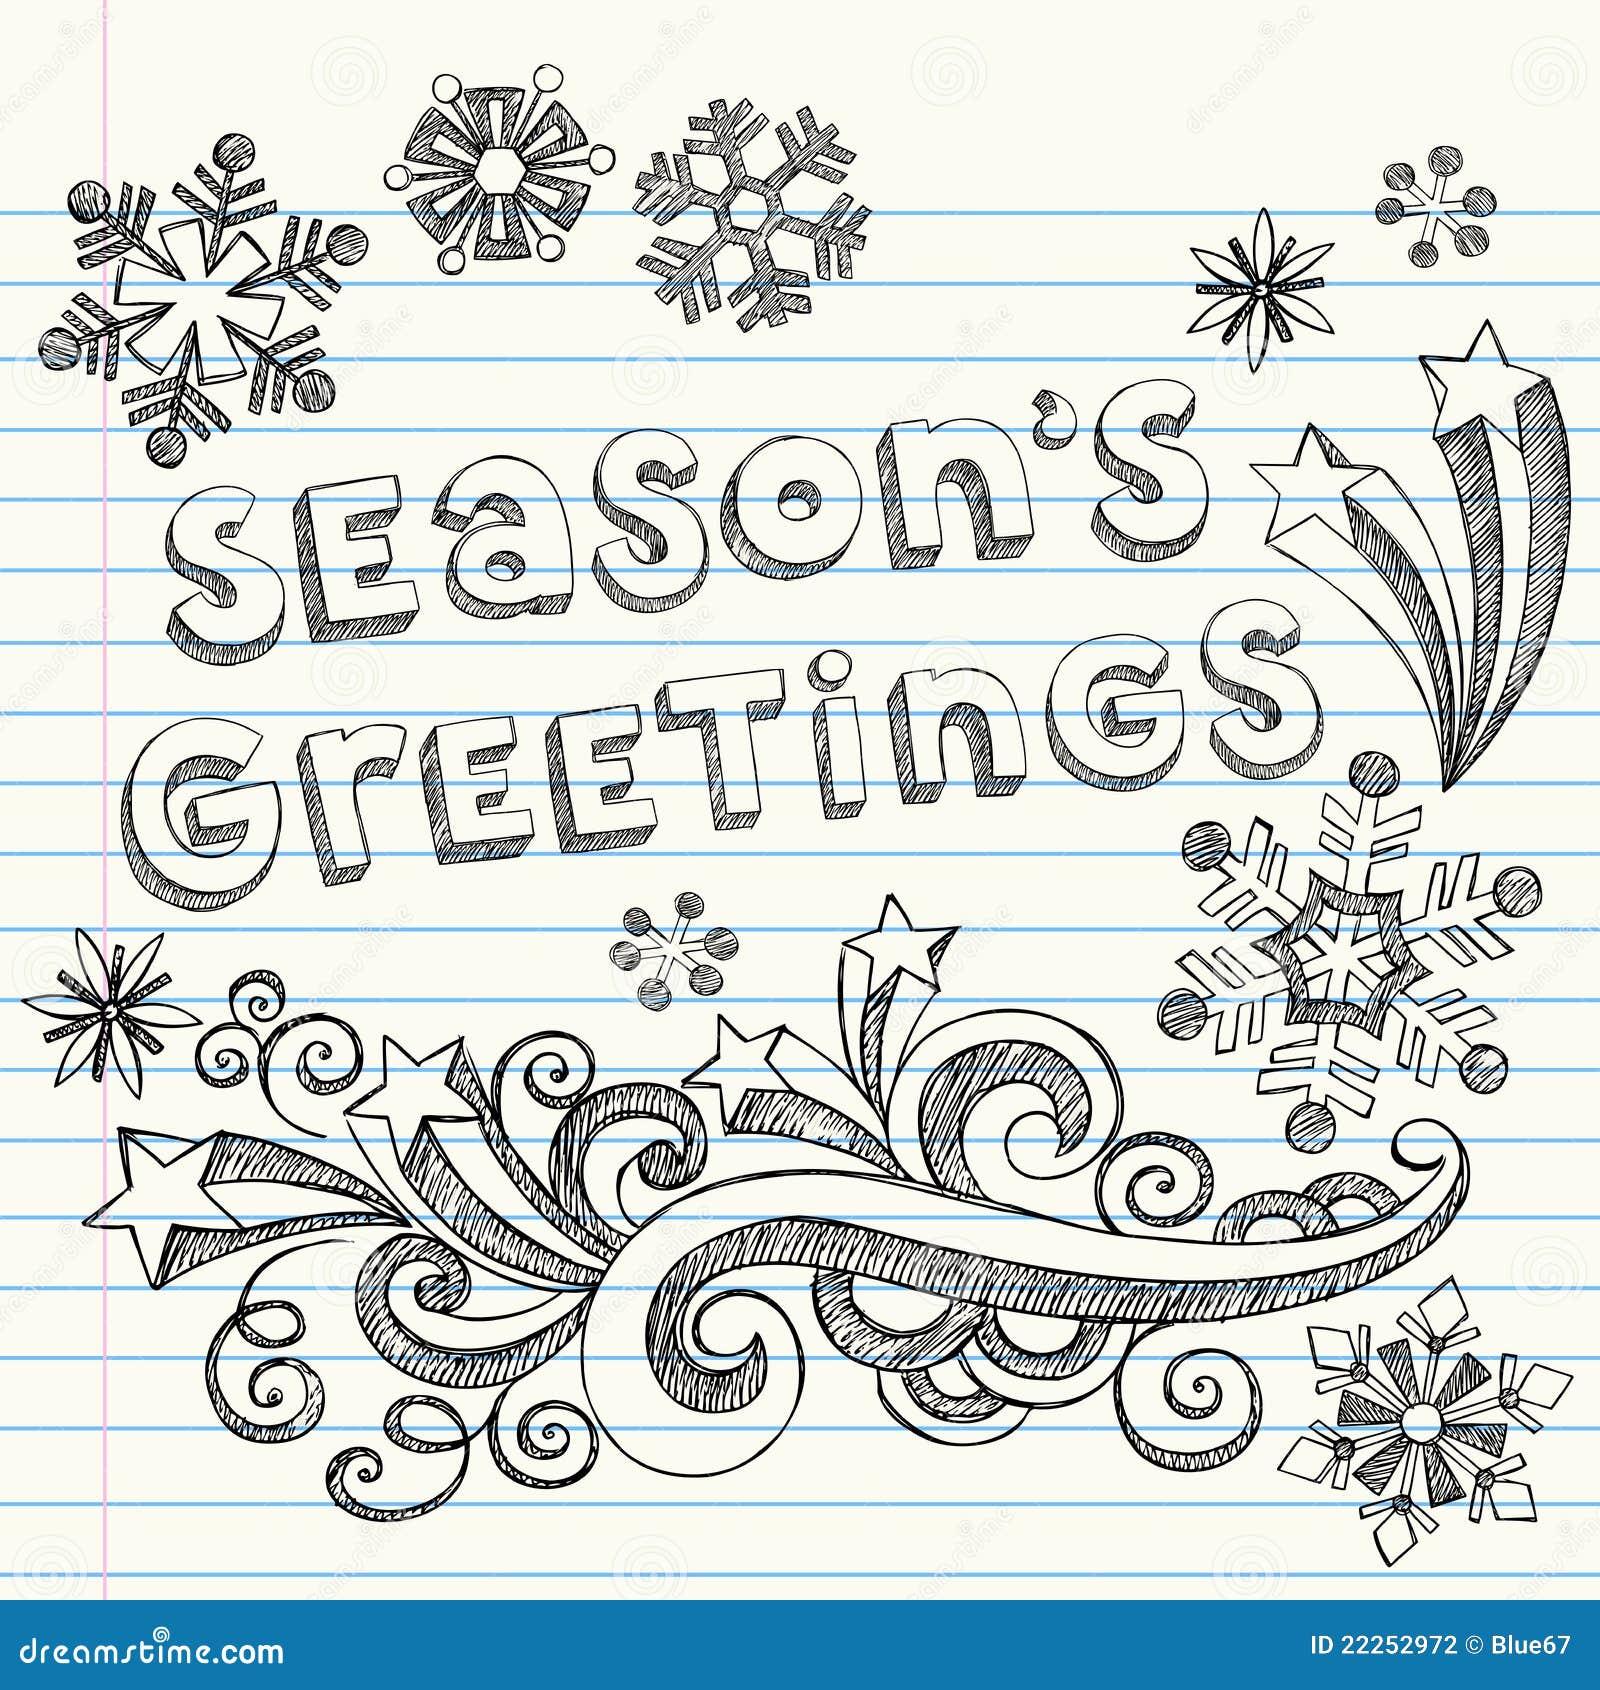 Seasons Greetings Hand Drawn Sketchy Doodles Stock Vector